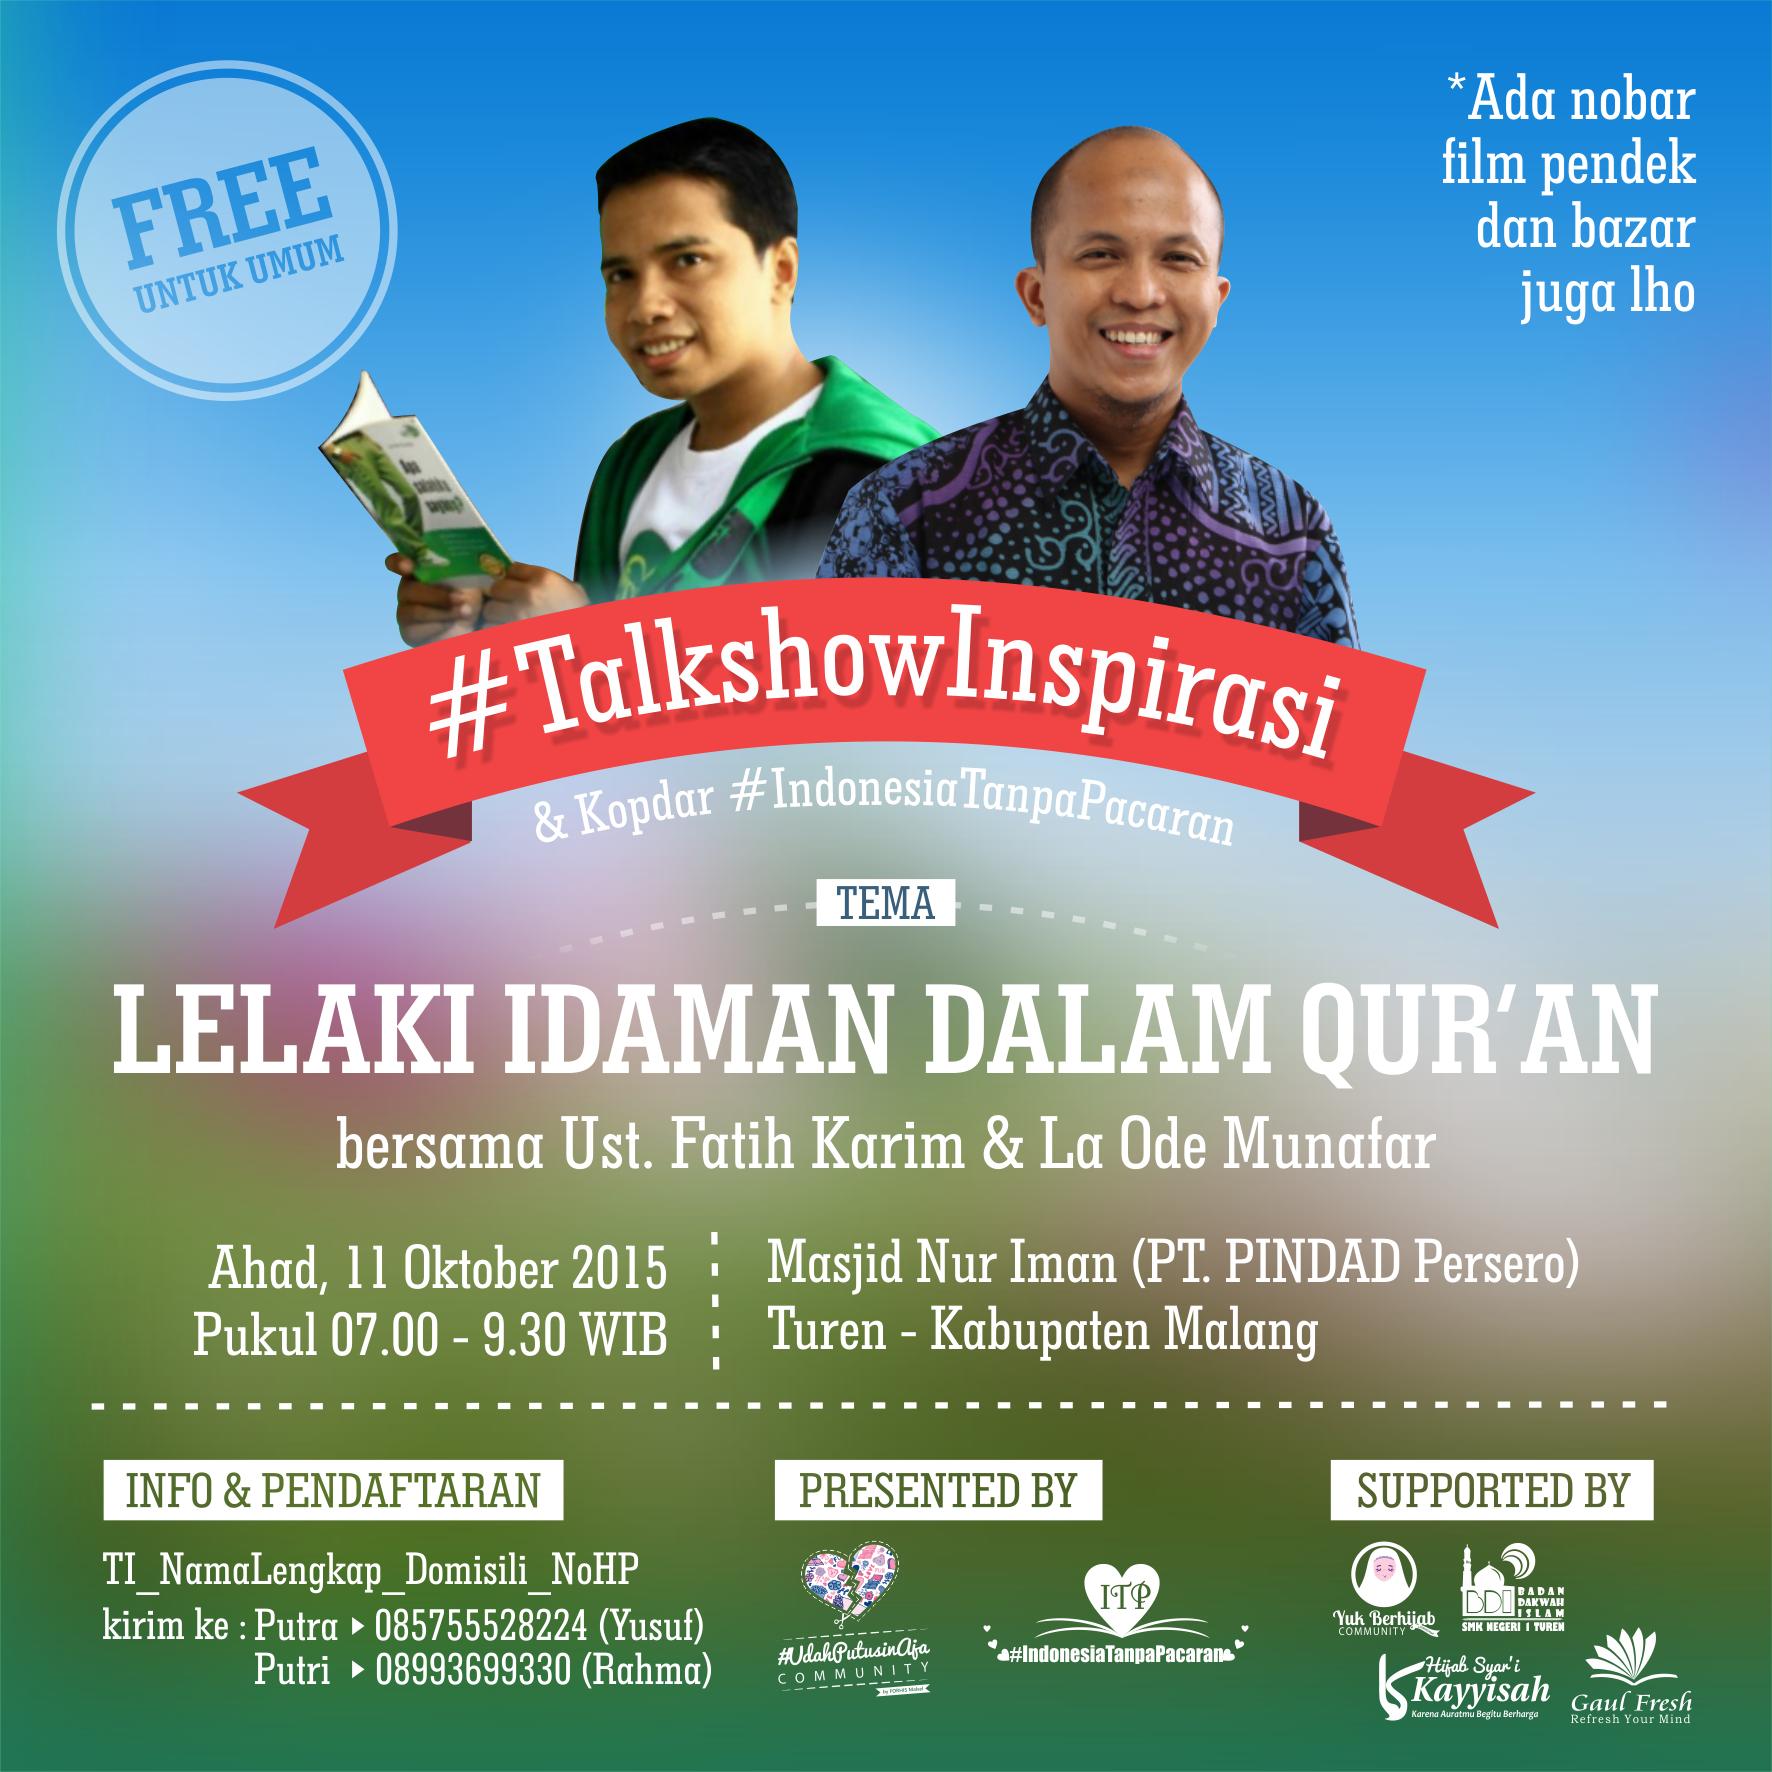 Badan Dakwah Islam SMK Negeri 1 Turen Gelorakan Semangatmu Di